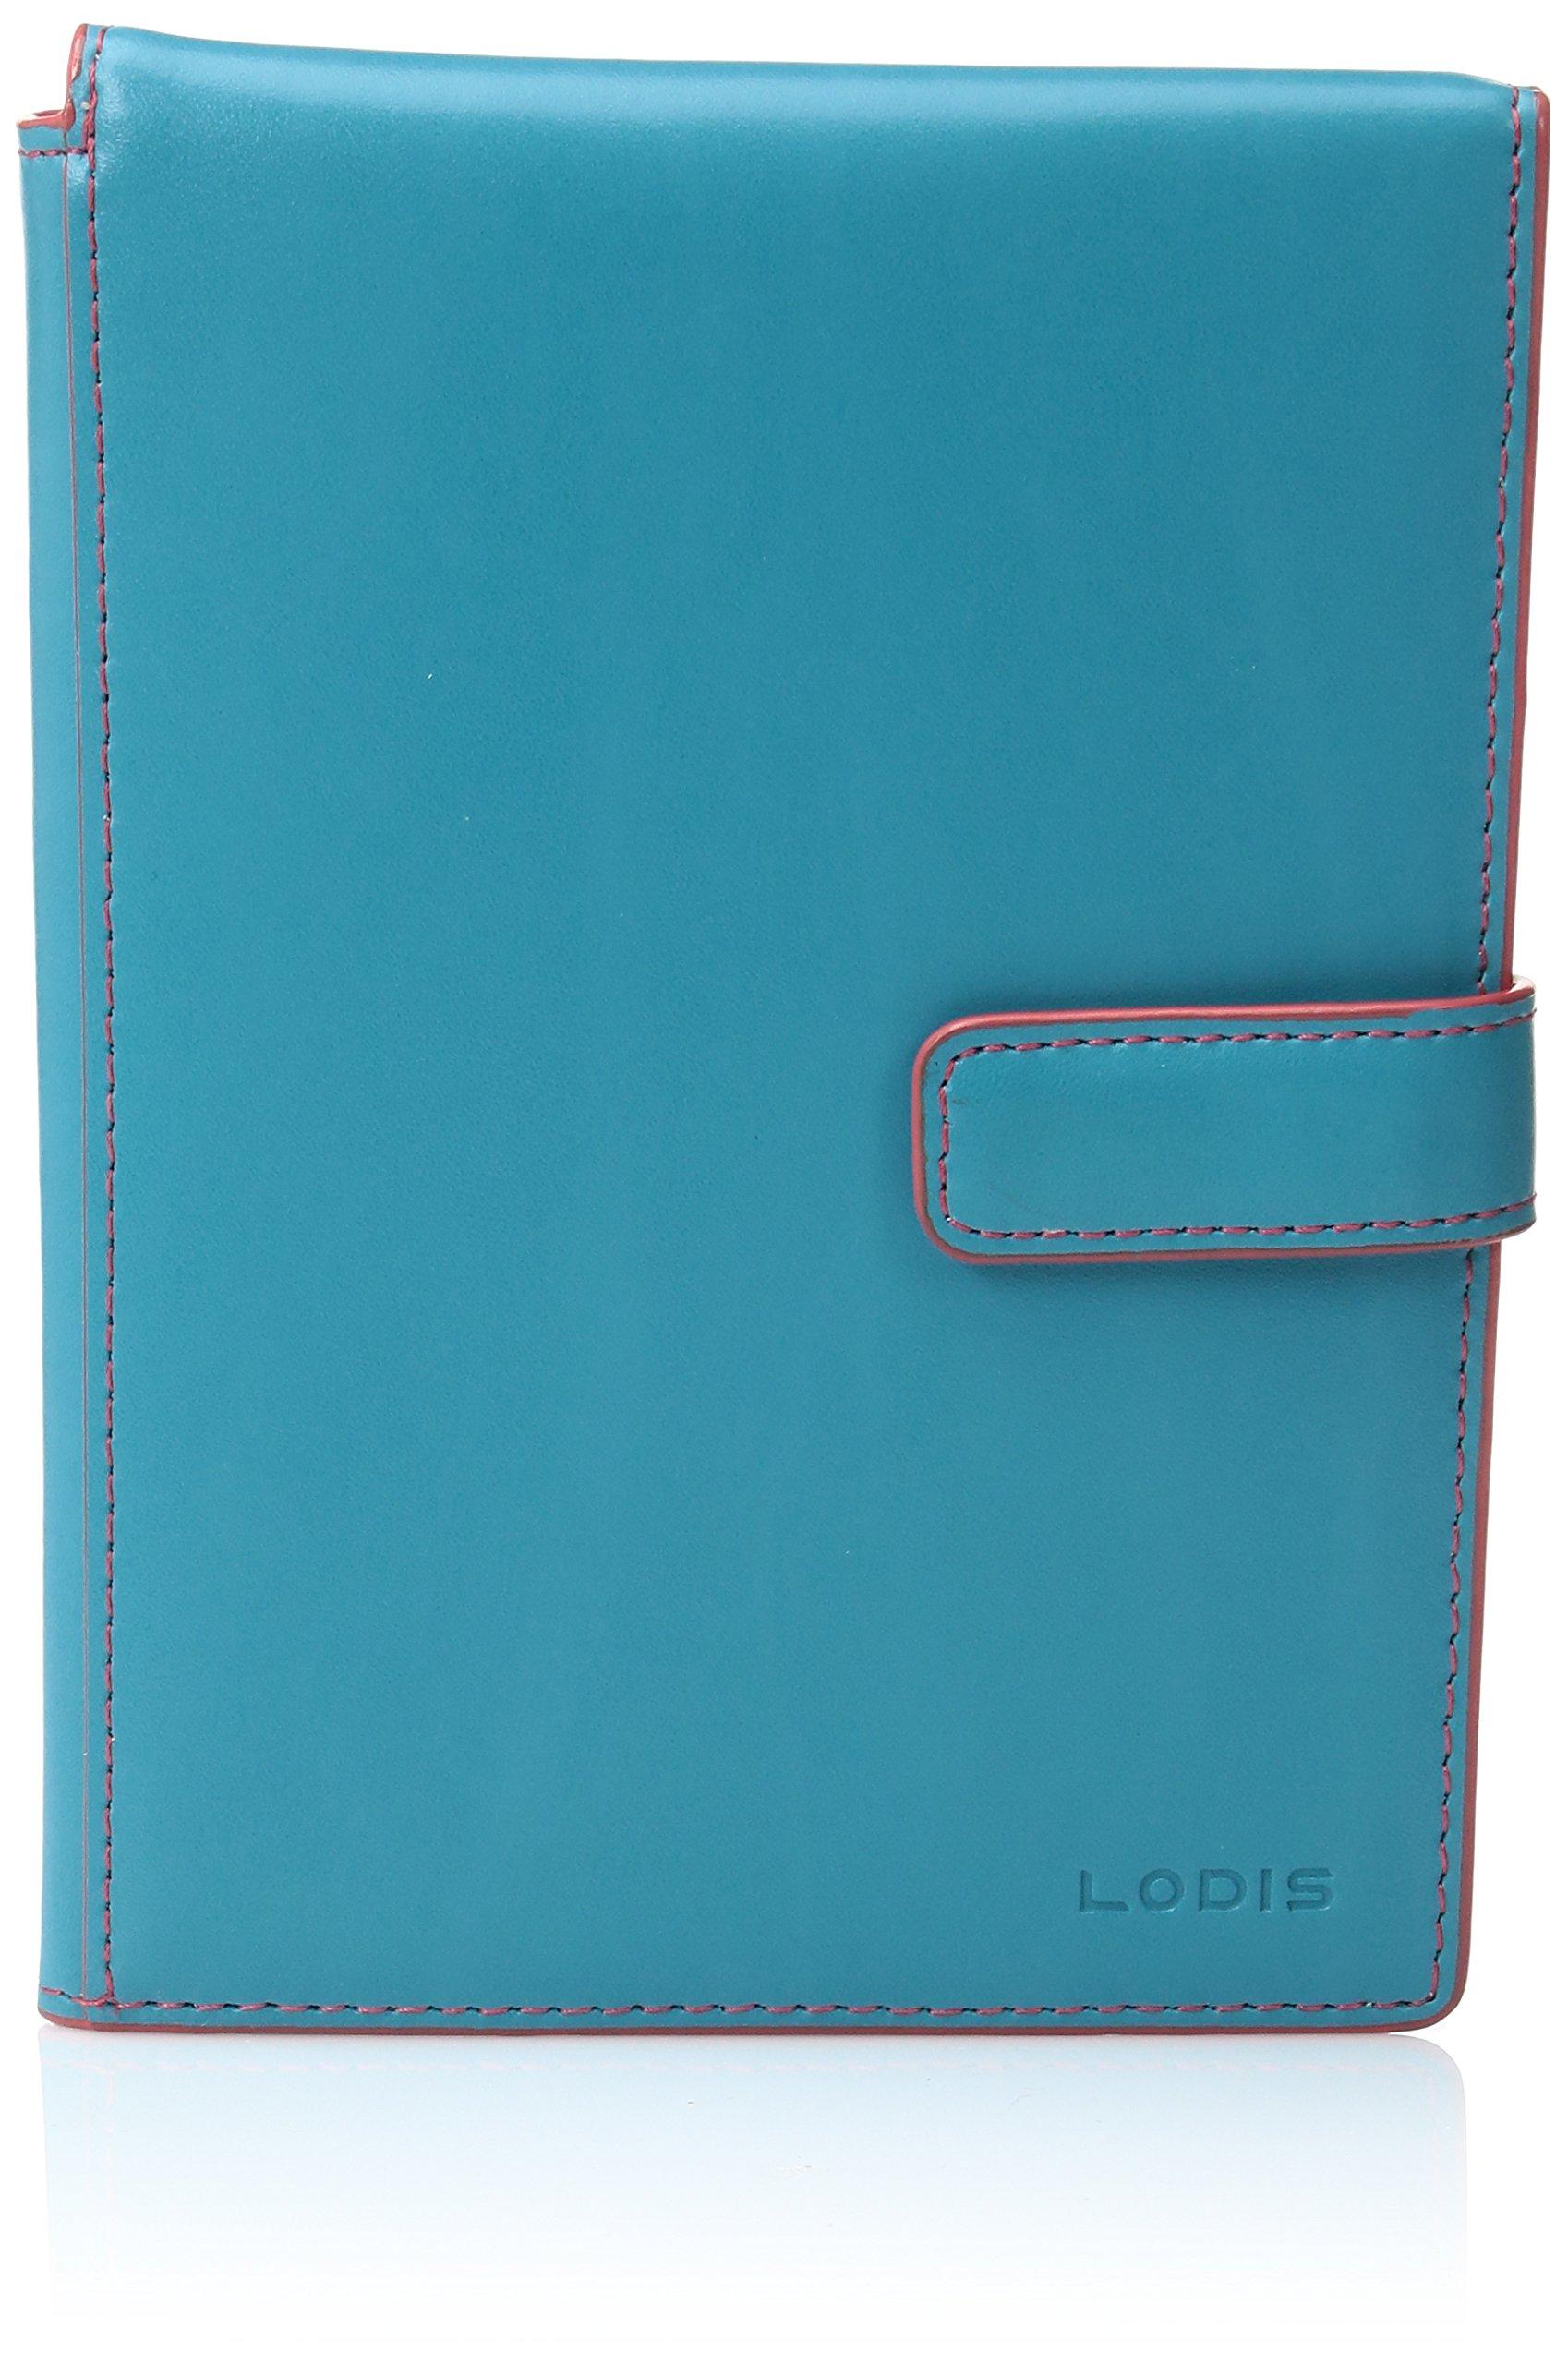 Audrey Pportwltwtktflp Tsc Pass Case, Turquoise/Coral, One Size